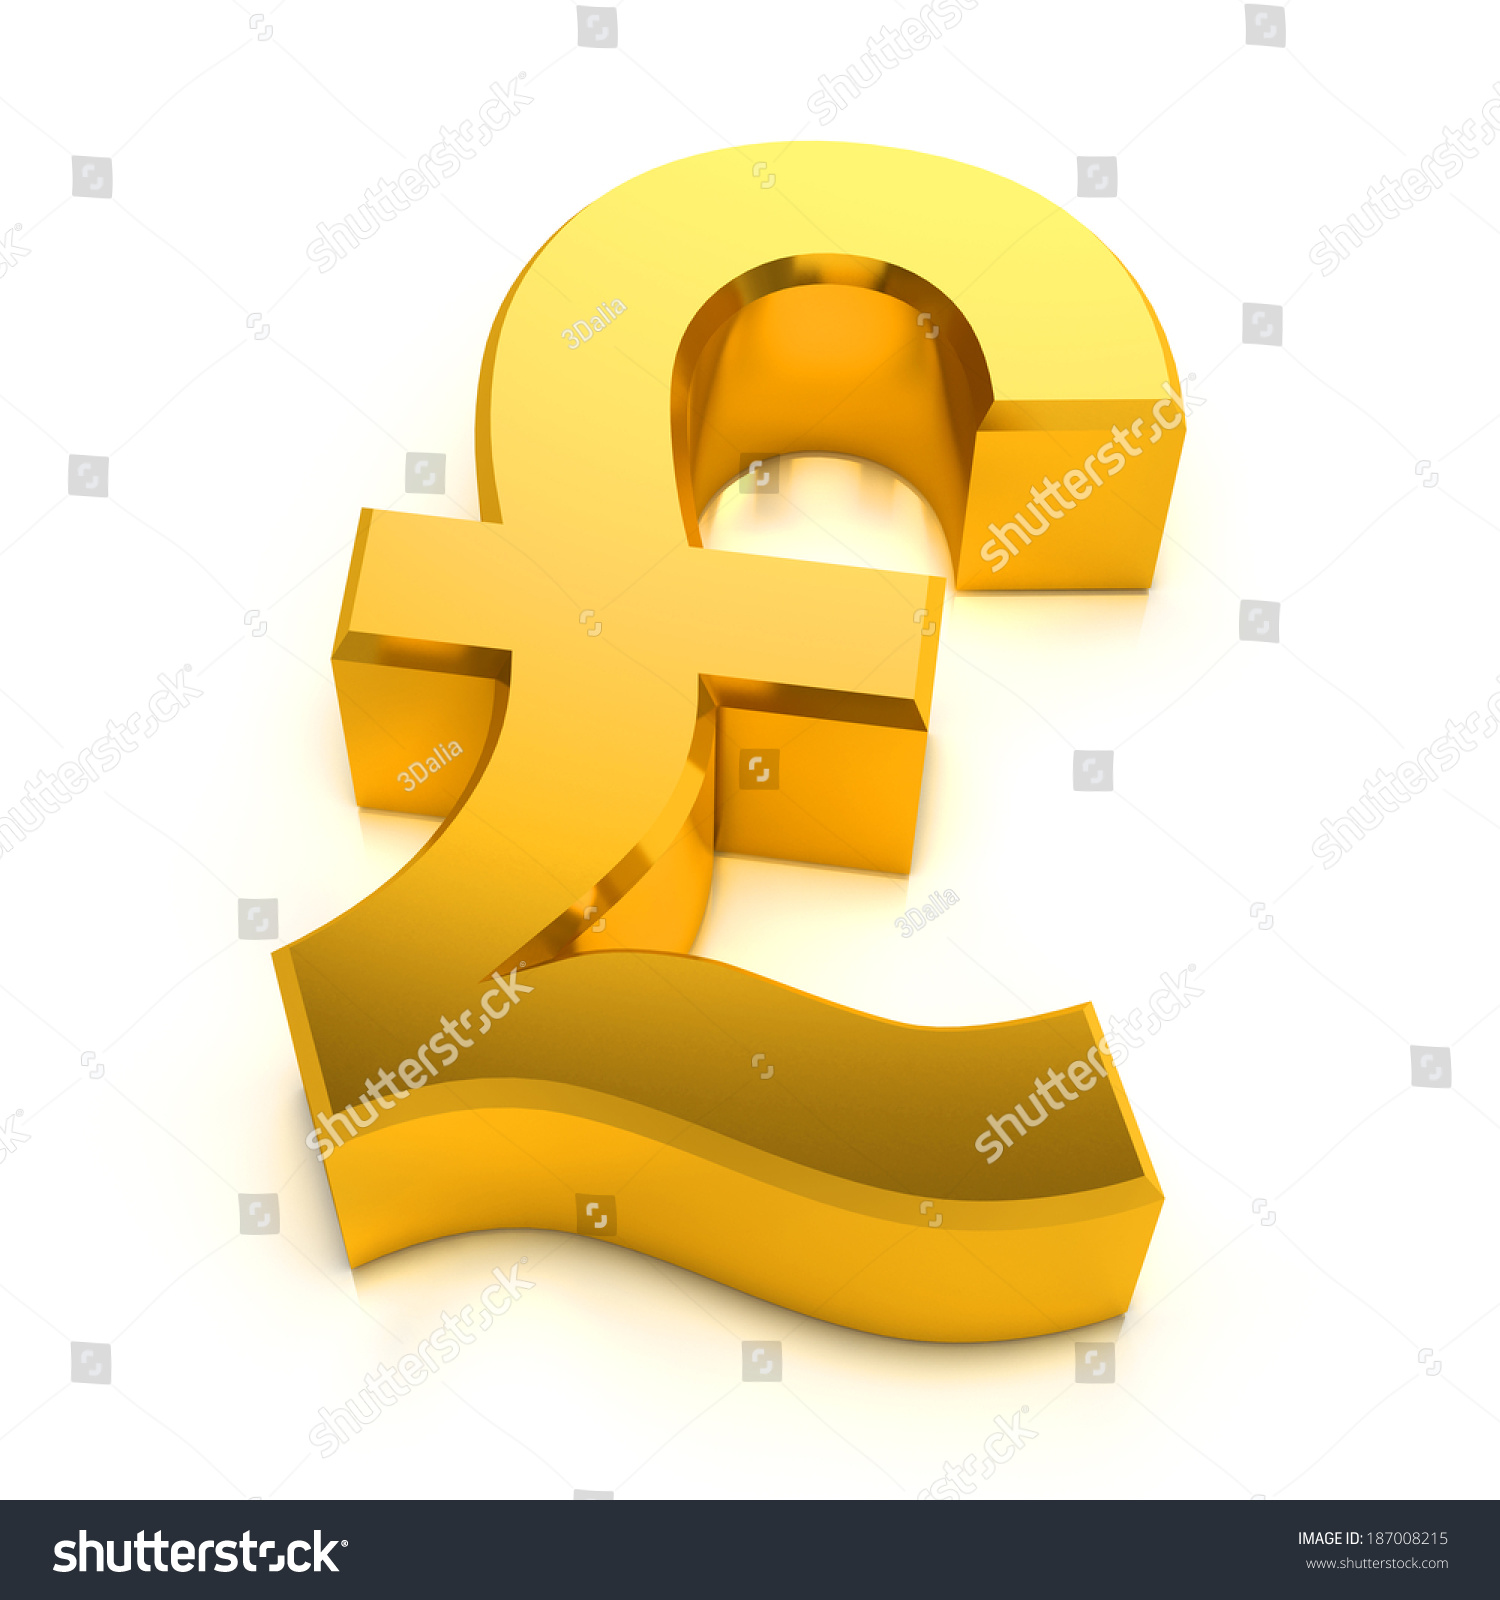 3d render golden uk pound symbol stock illustration 187008215 3d render of a golden uk pound symbol buycottarizona